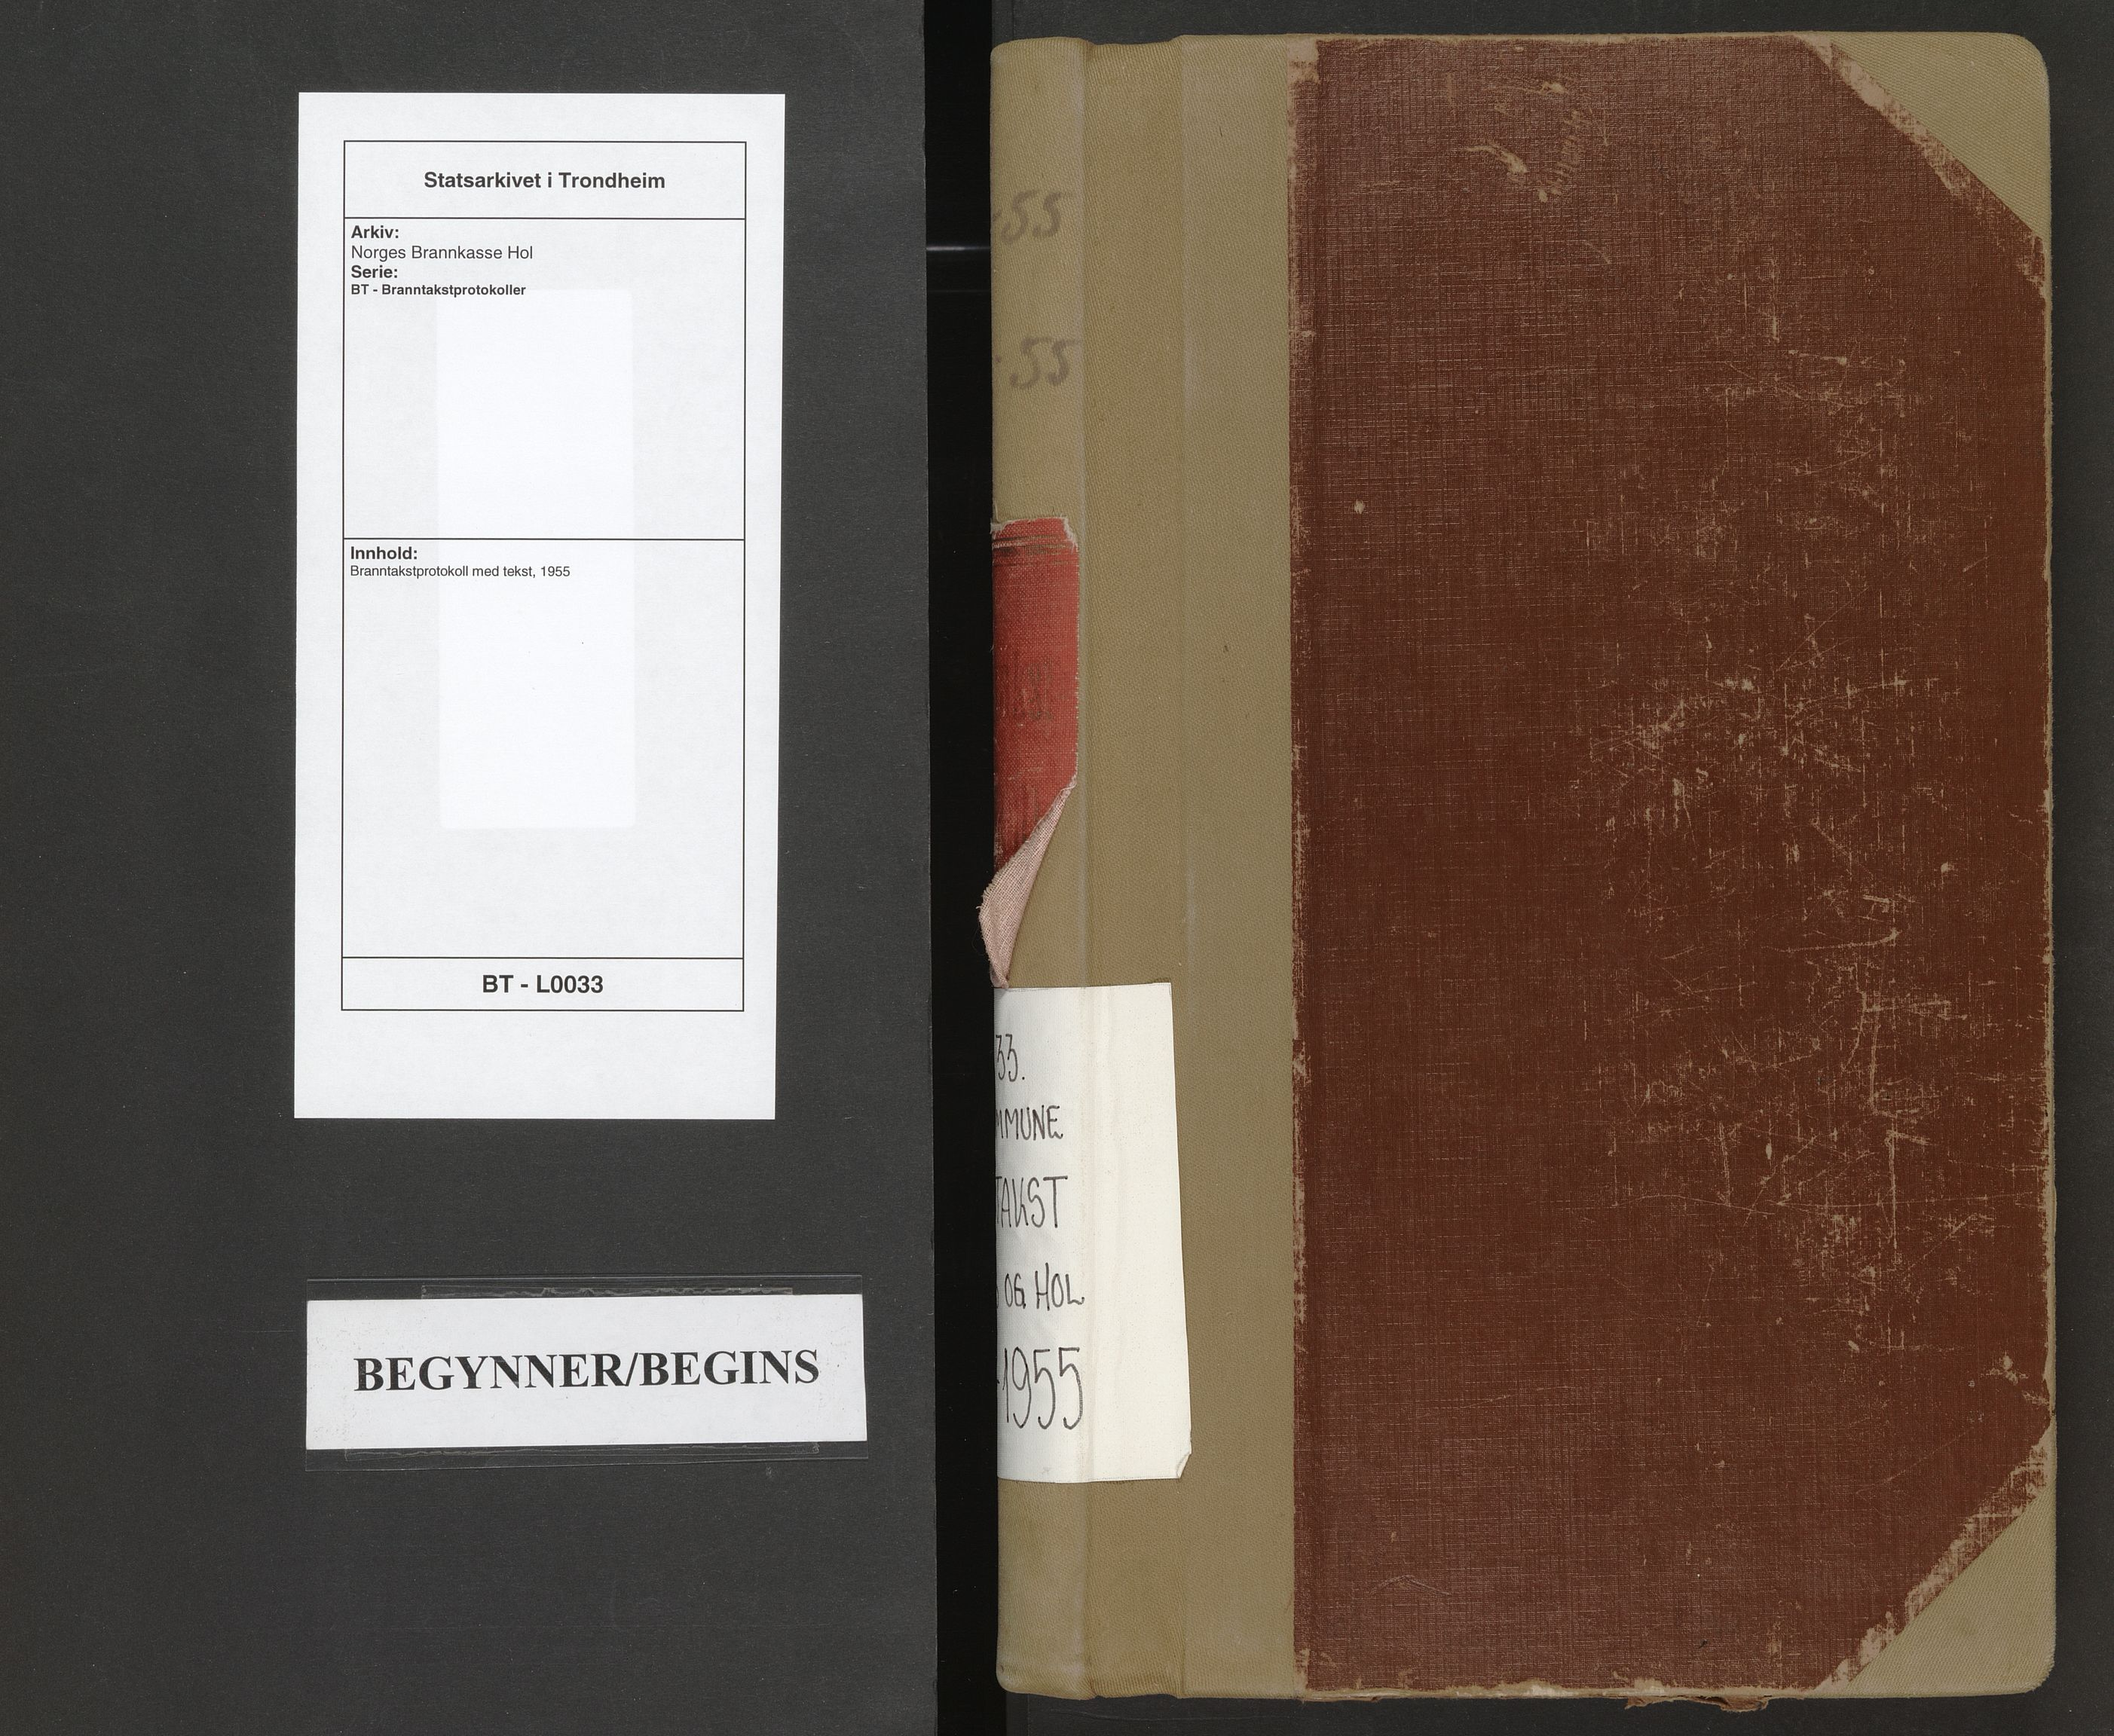 SAT, Norges Brannkasse Hol, BT/L0033: Branntakstprotokoll med tekst, 1955